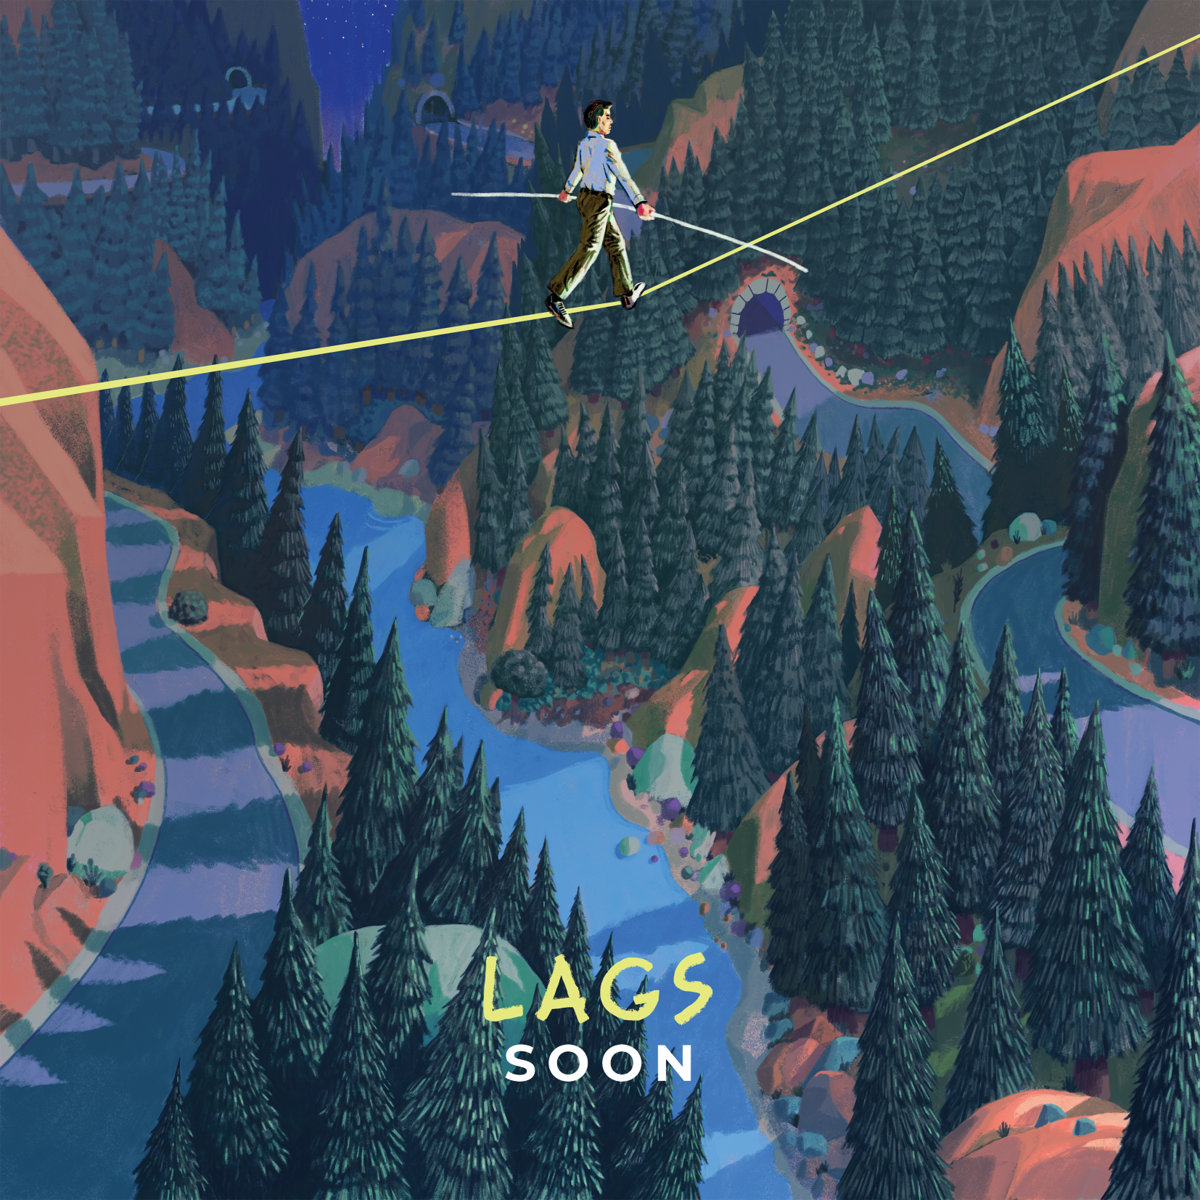 Lags-soon